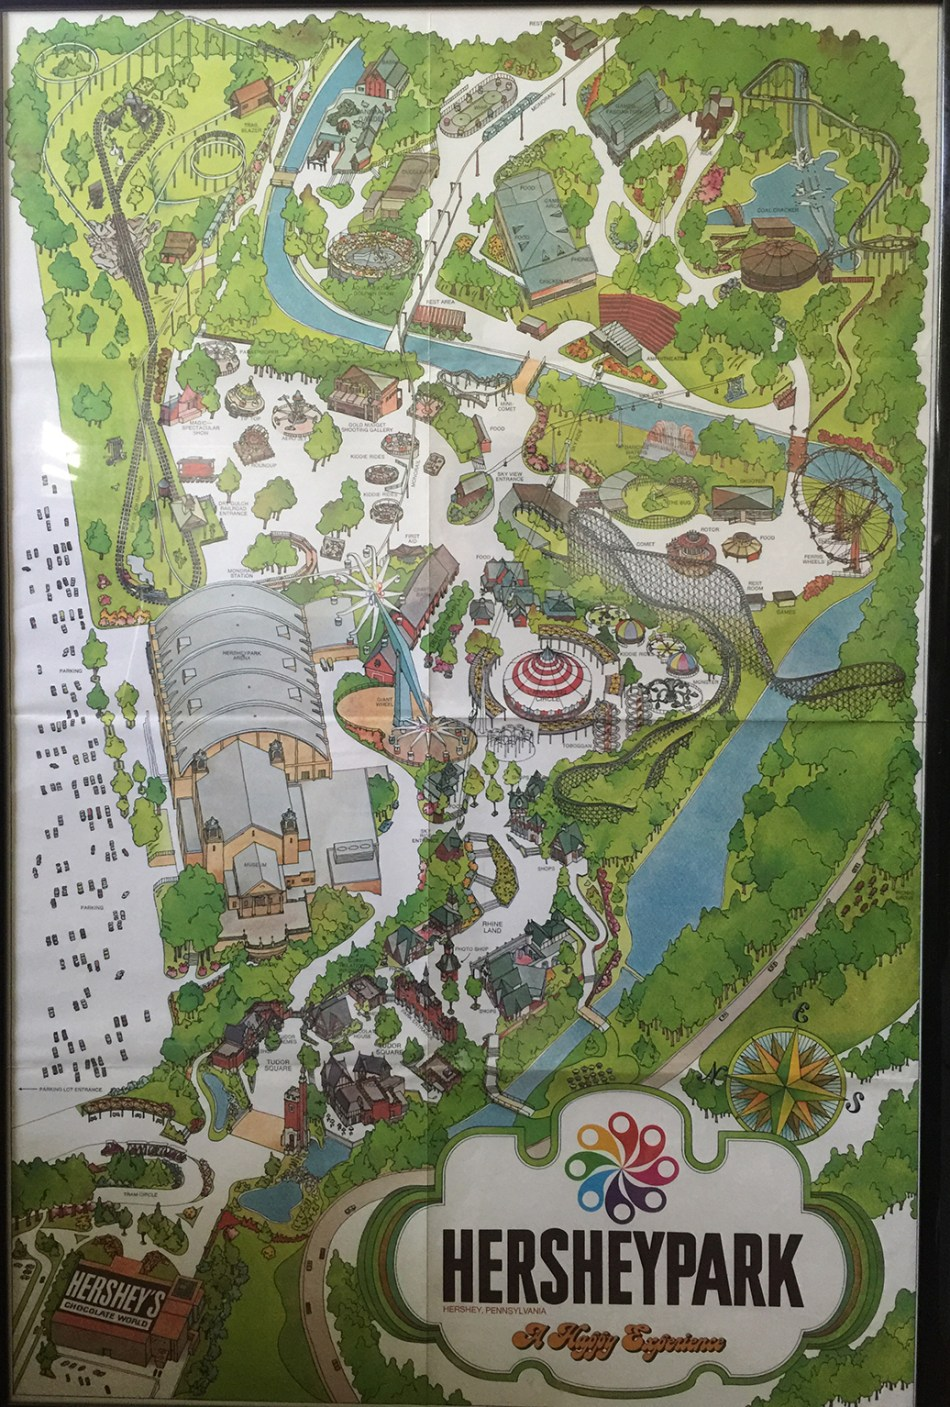 1974 Hersheypark Souvenir map